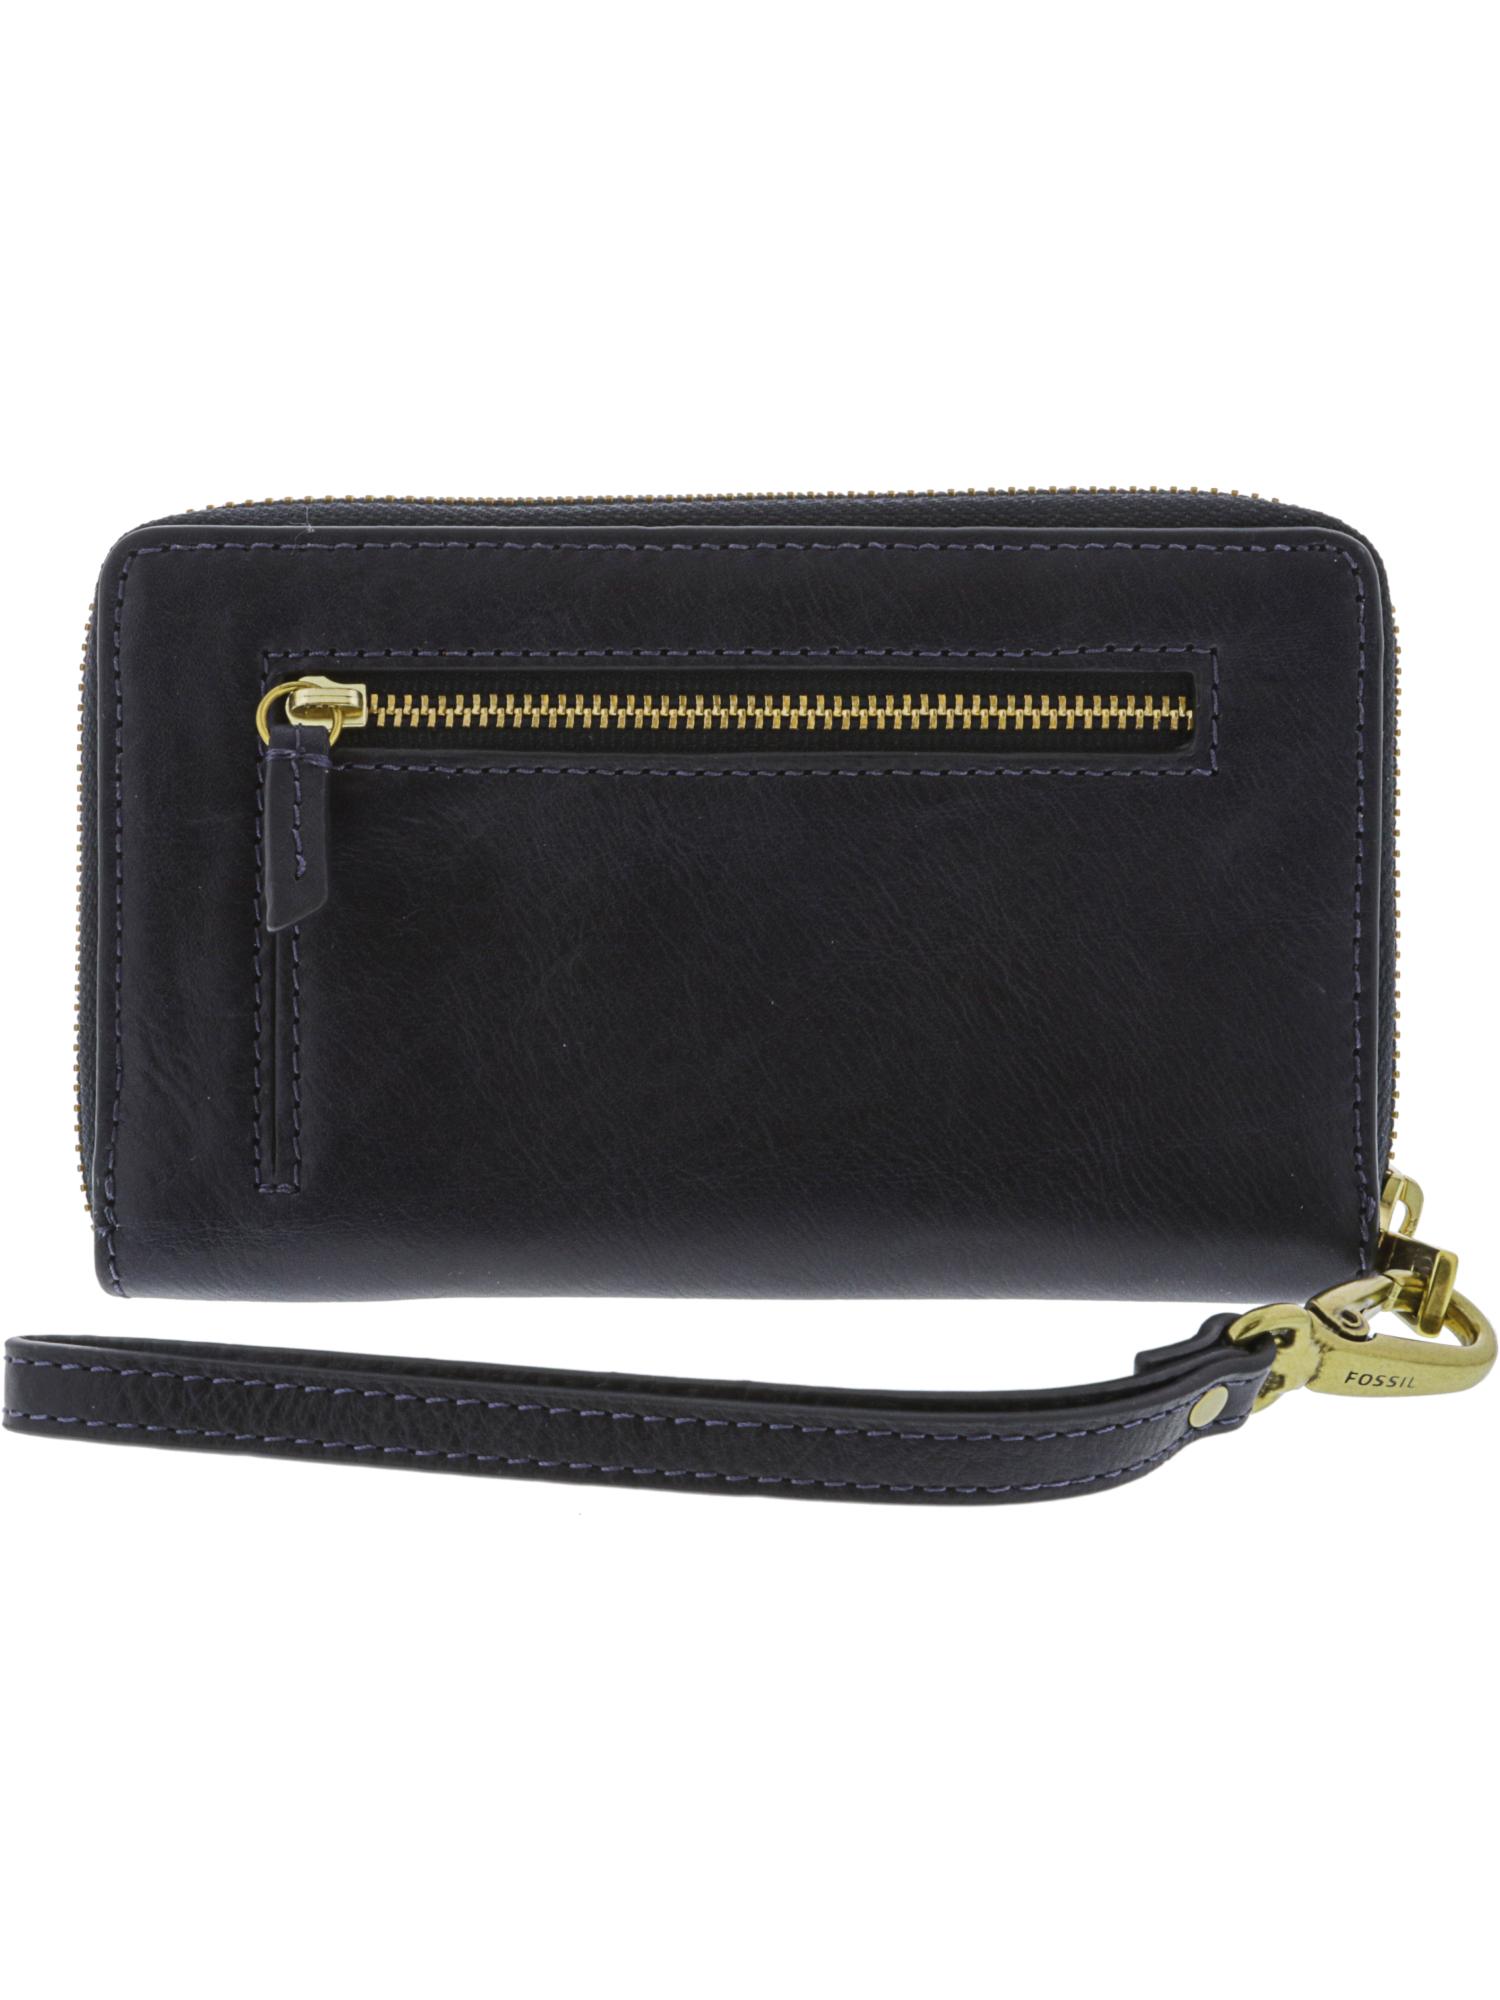 Fossil-Women-039-s-Emma-Smartphone-Wallet-Leather-Wristlet thumbnail 7